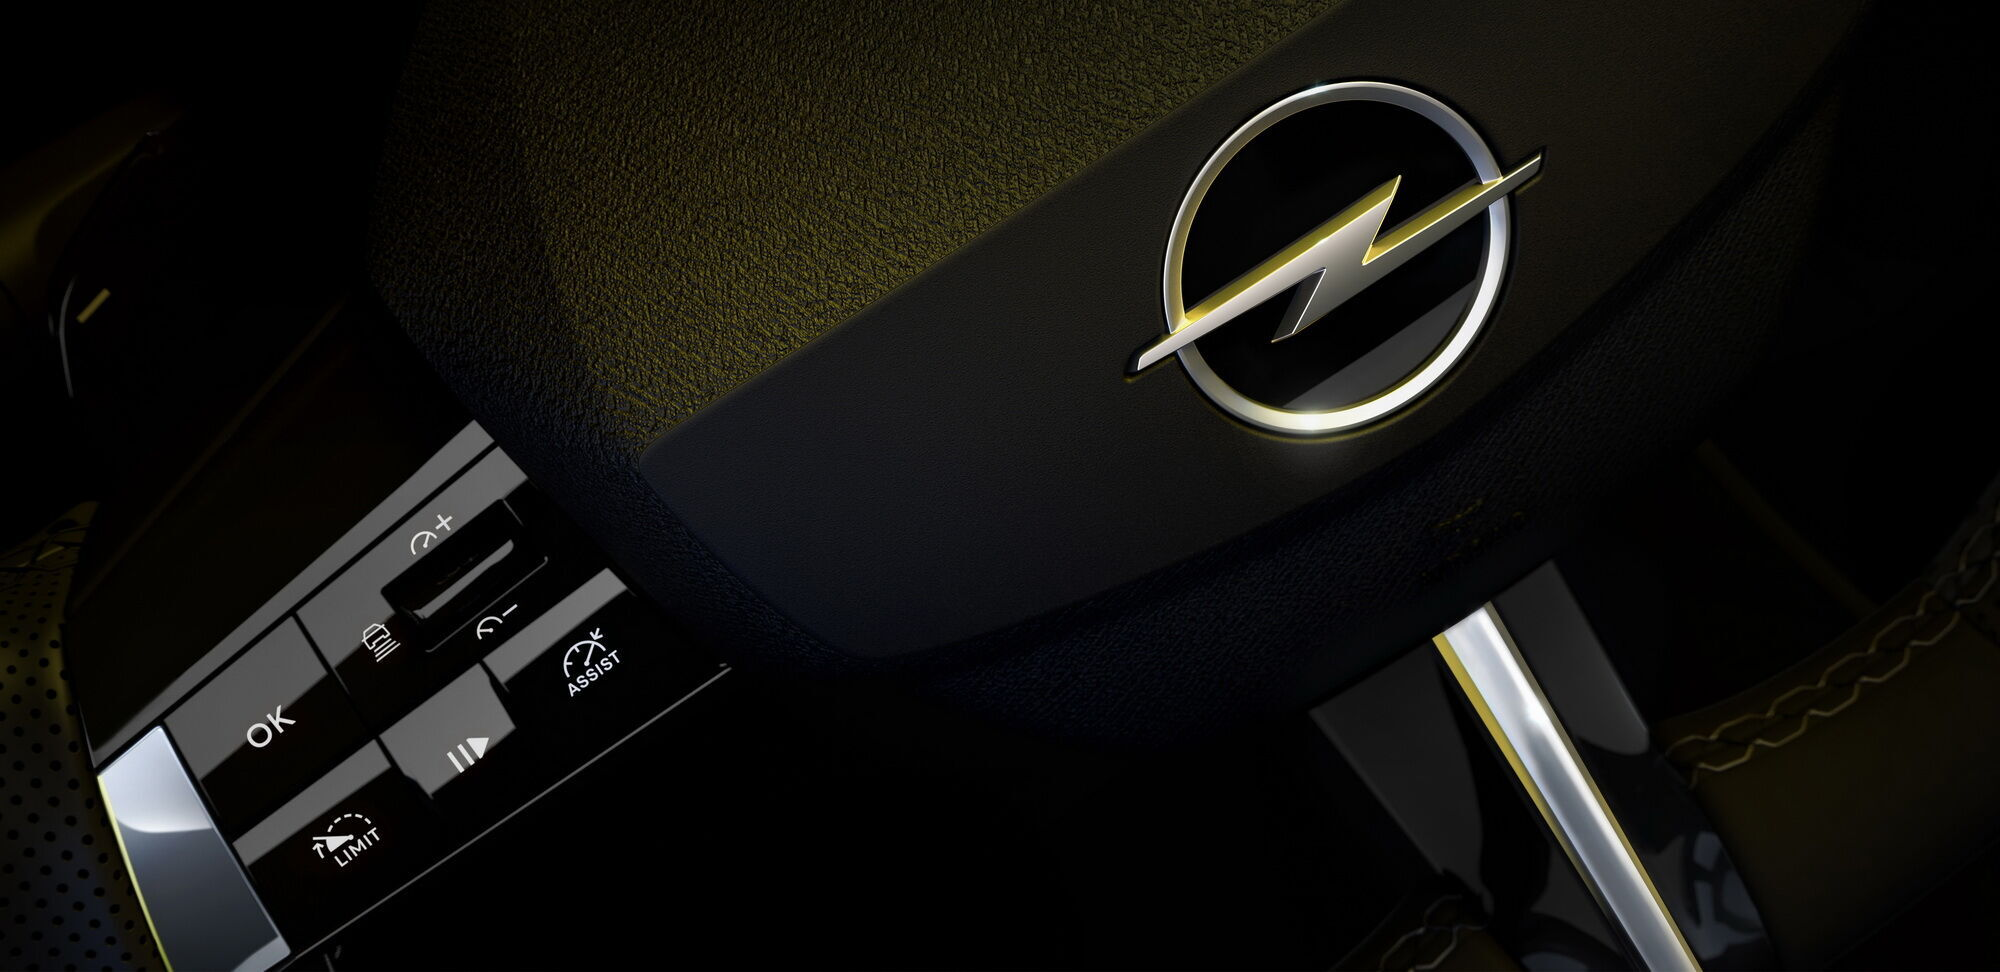 На руле Astra будут сенсорные кнопки